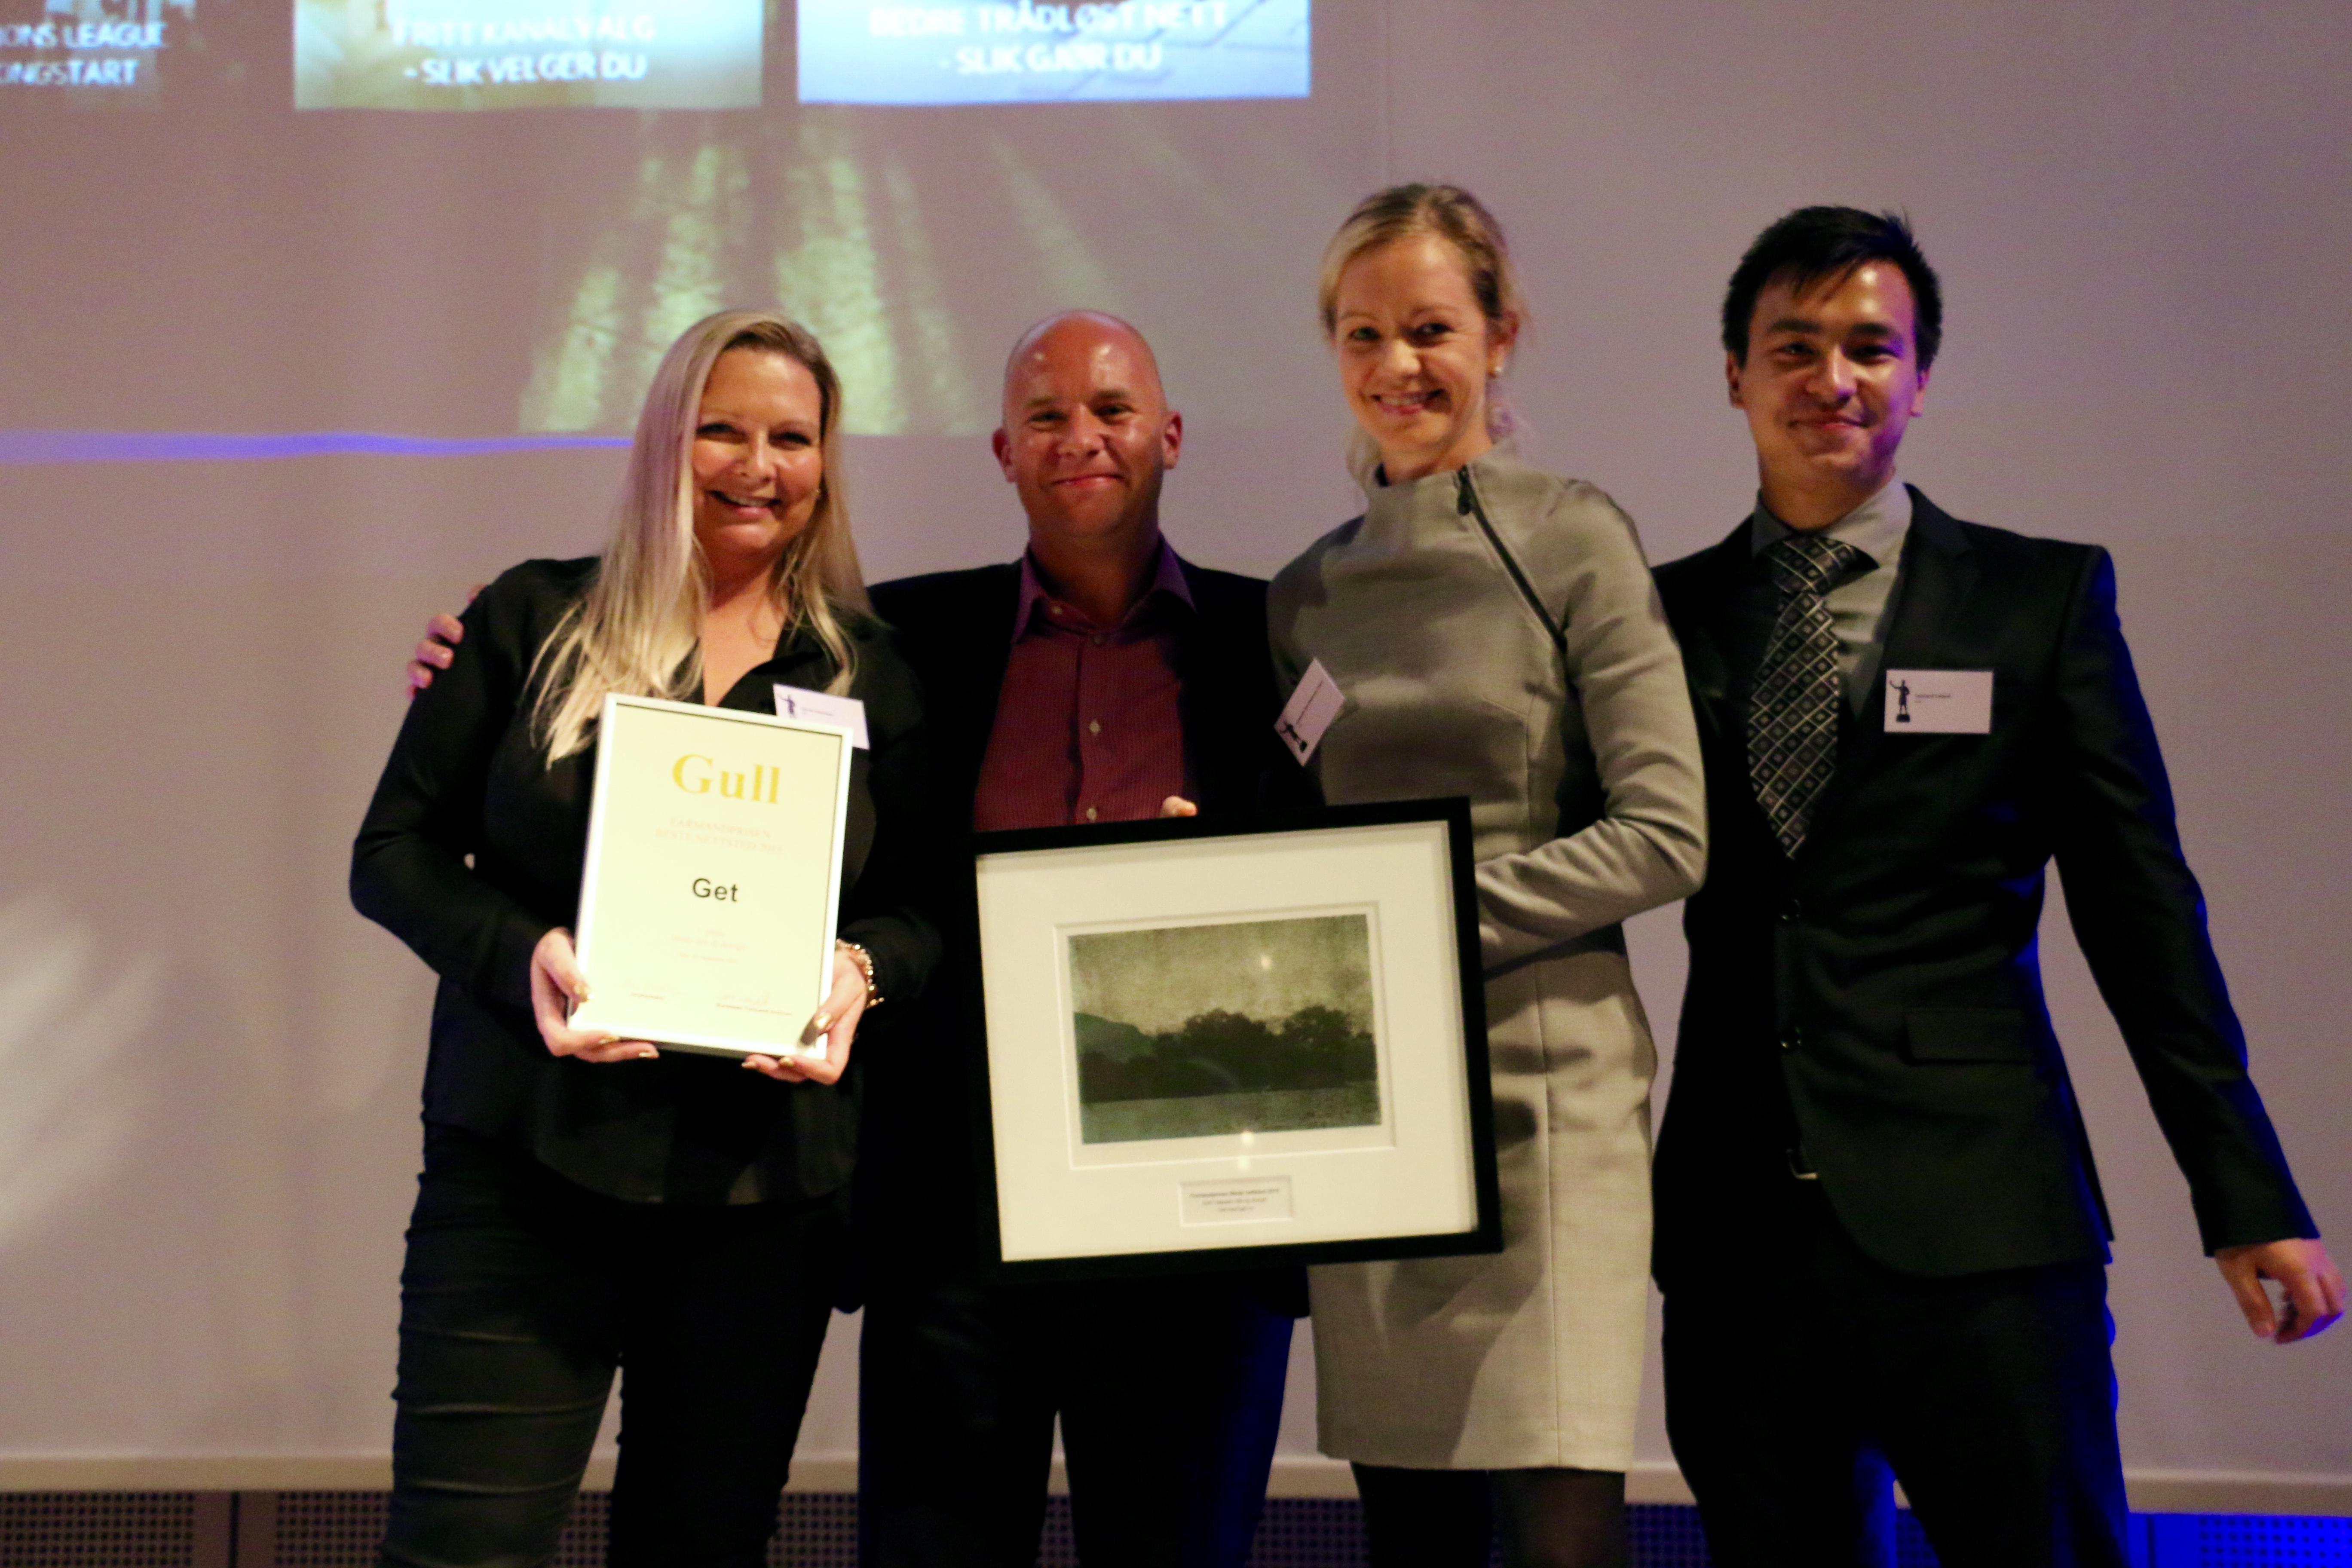 Farmandprisen Beste nettted 2015 - Beste Ide & design nr 1: Get (get.no)